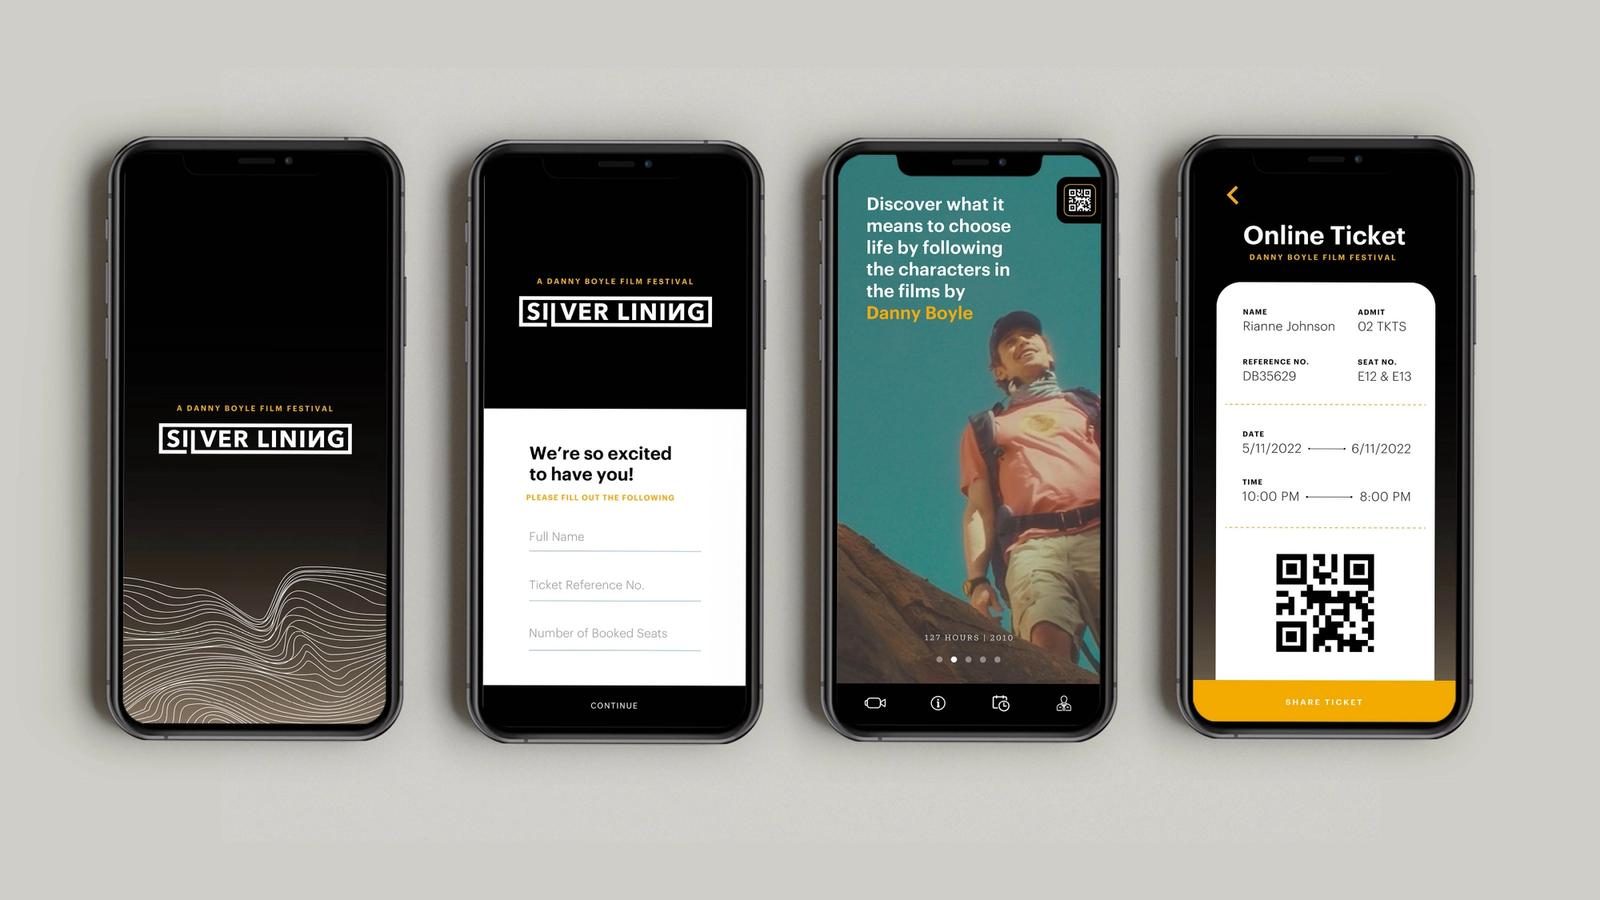 Silver Lining Mobile App // Danny Boyle Film Festival